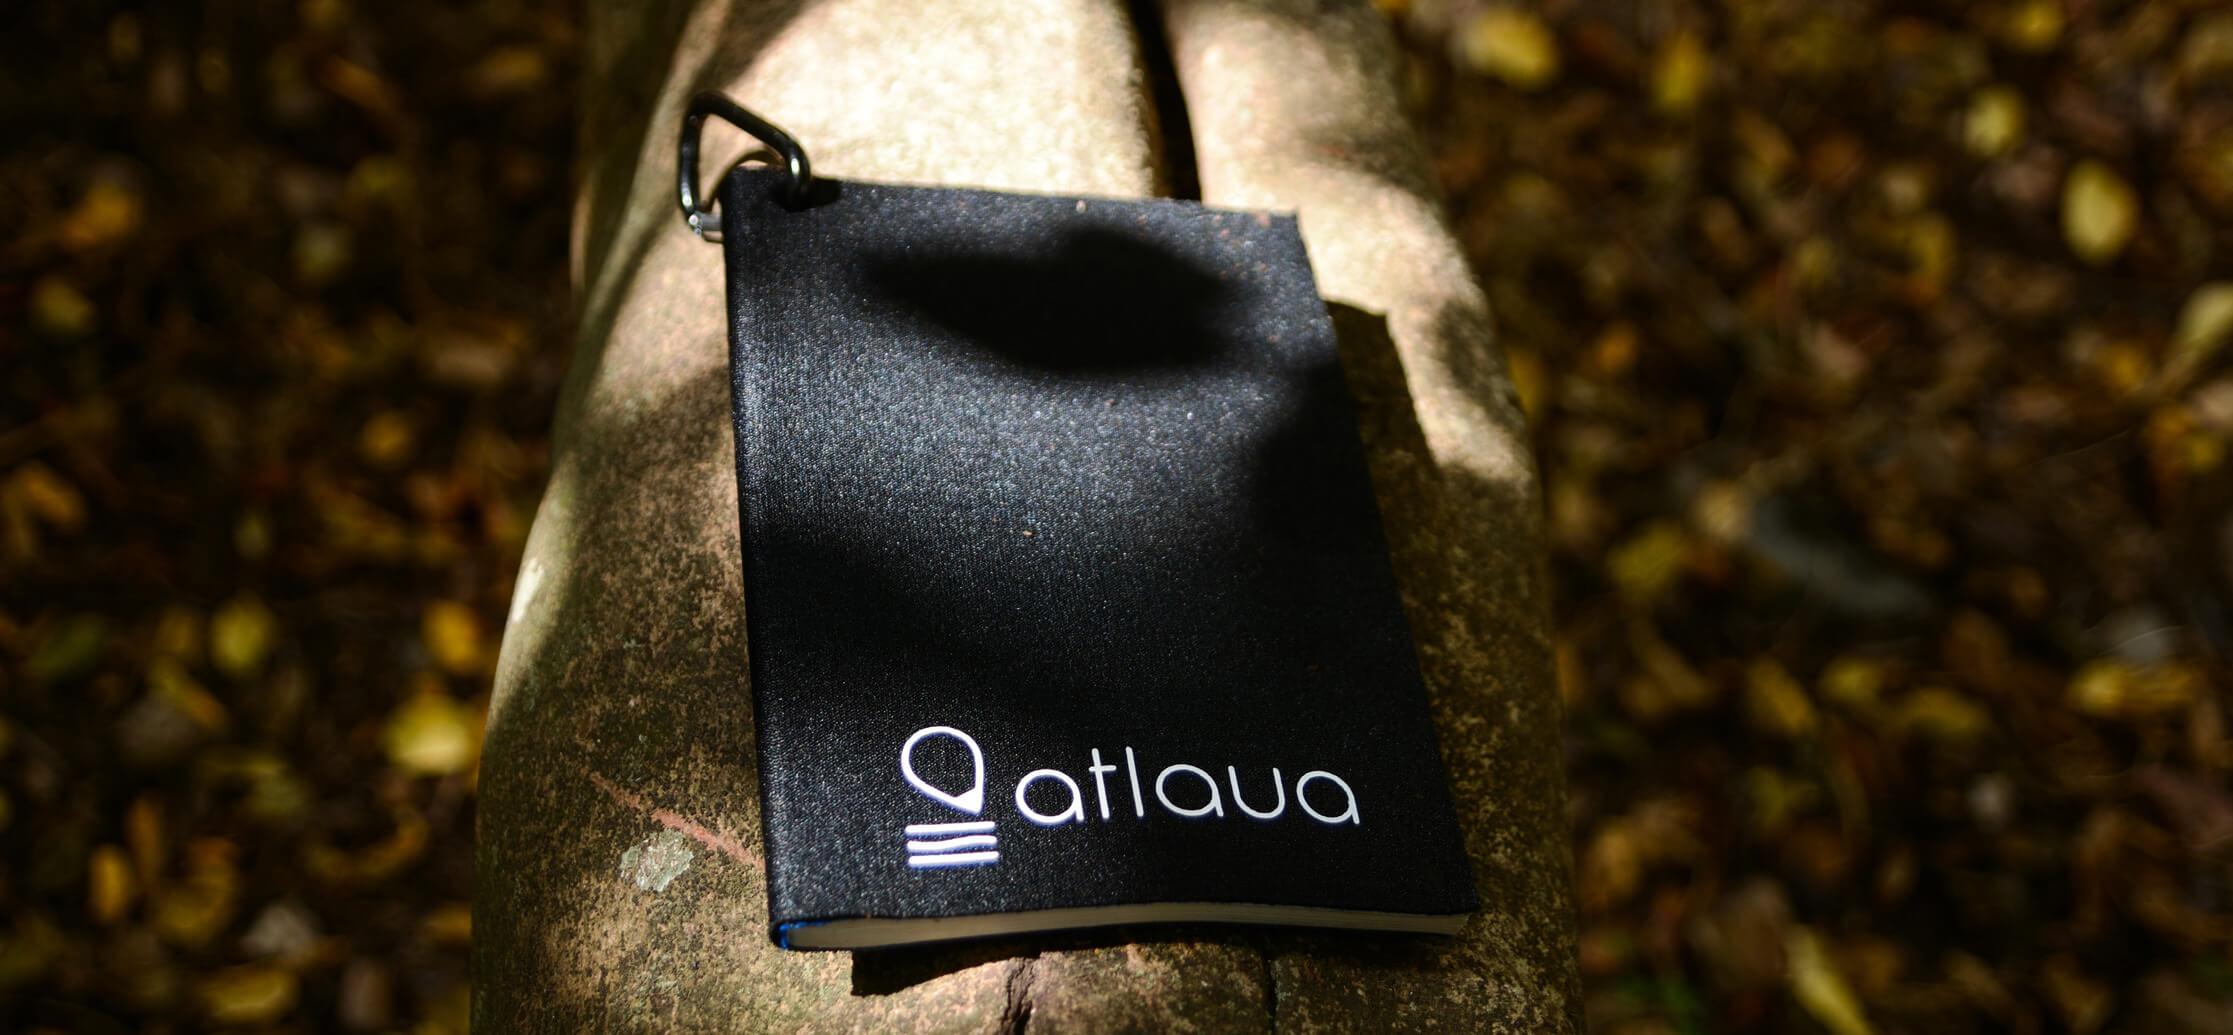 Atlaua black waterproof notebook for trekking adn camping (2)